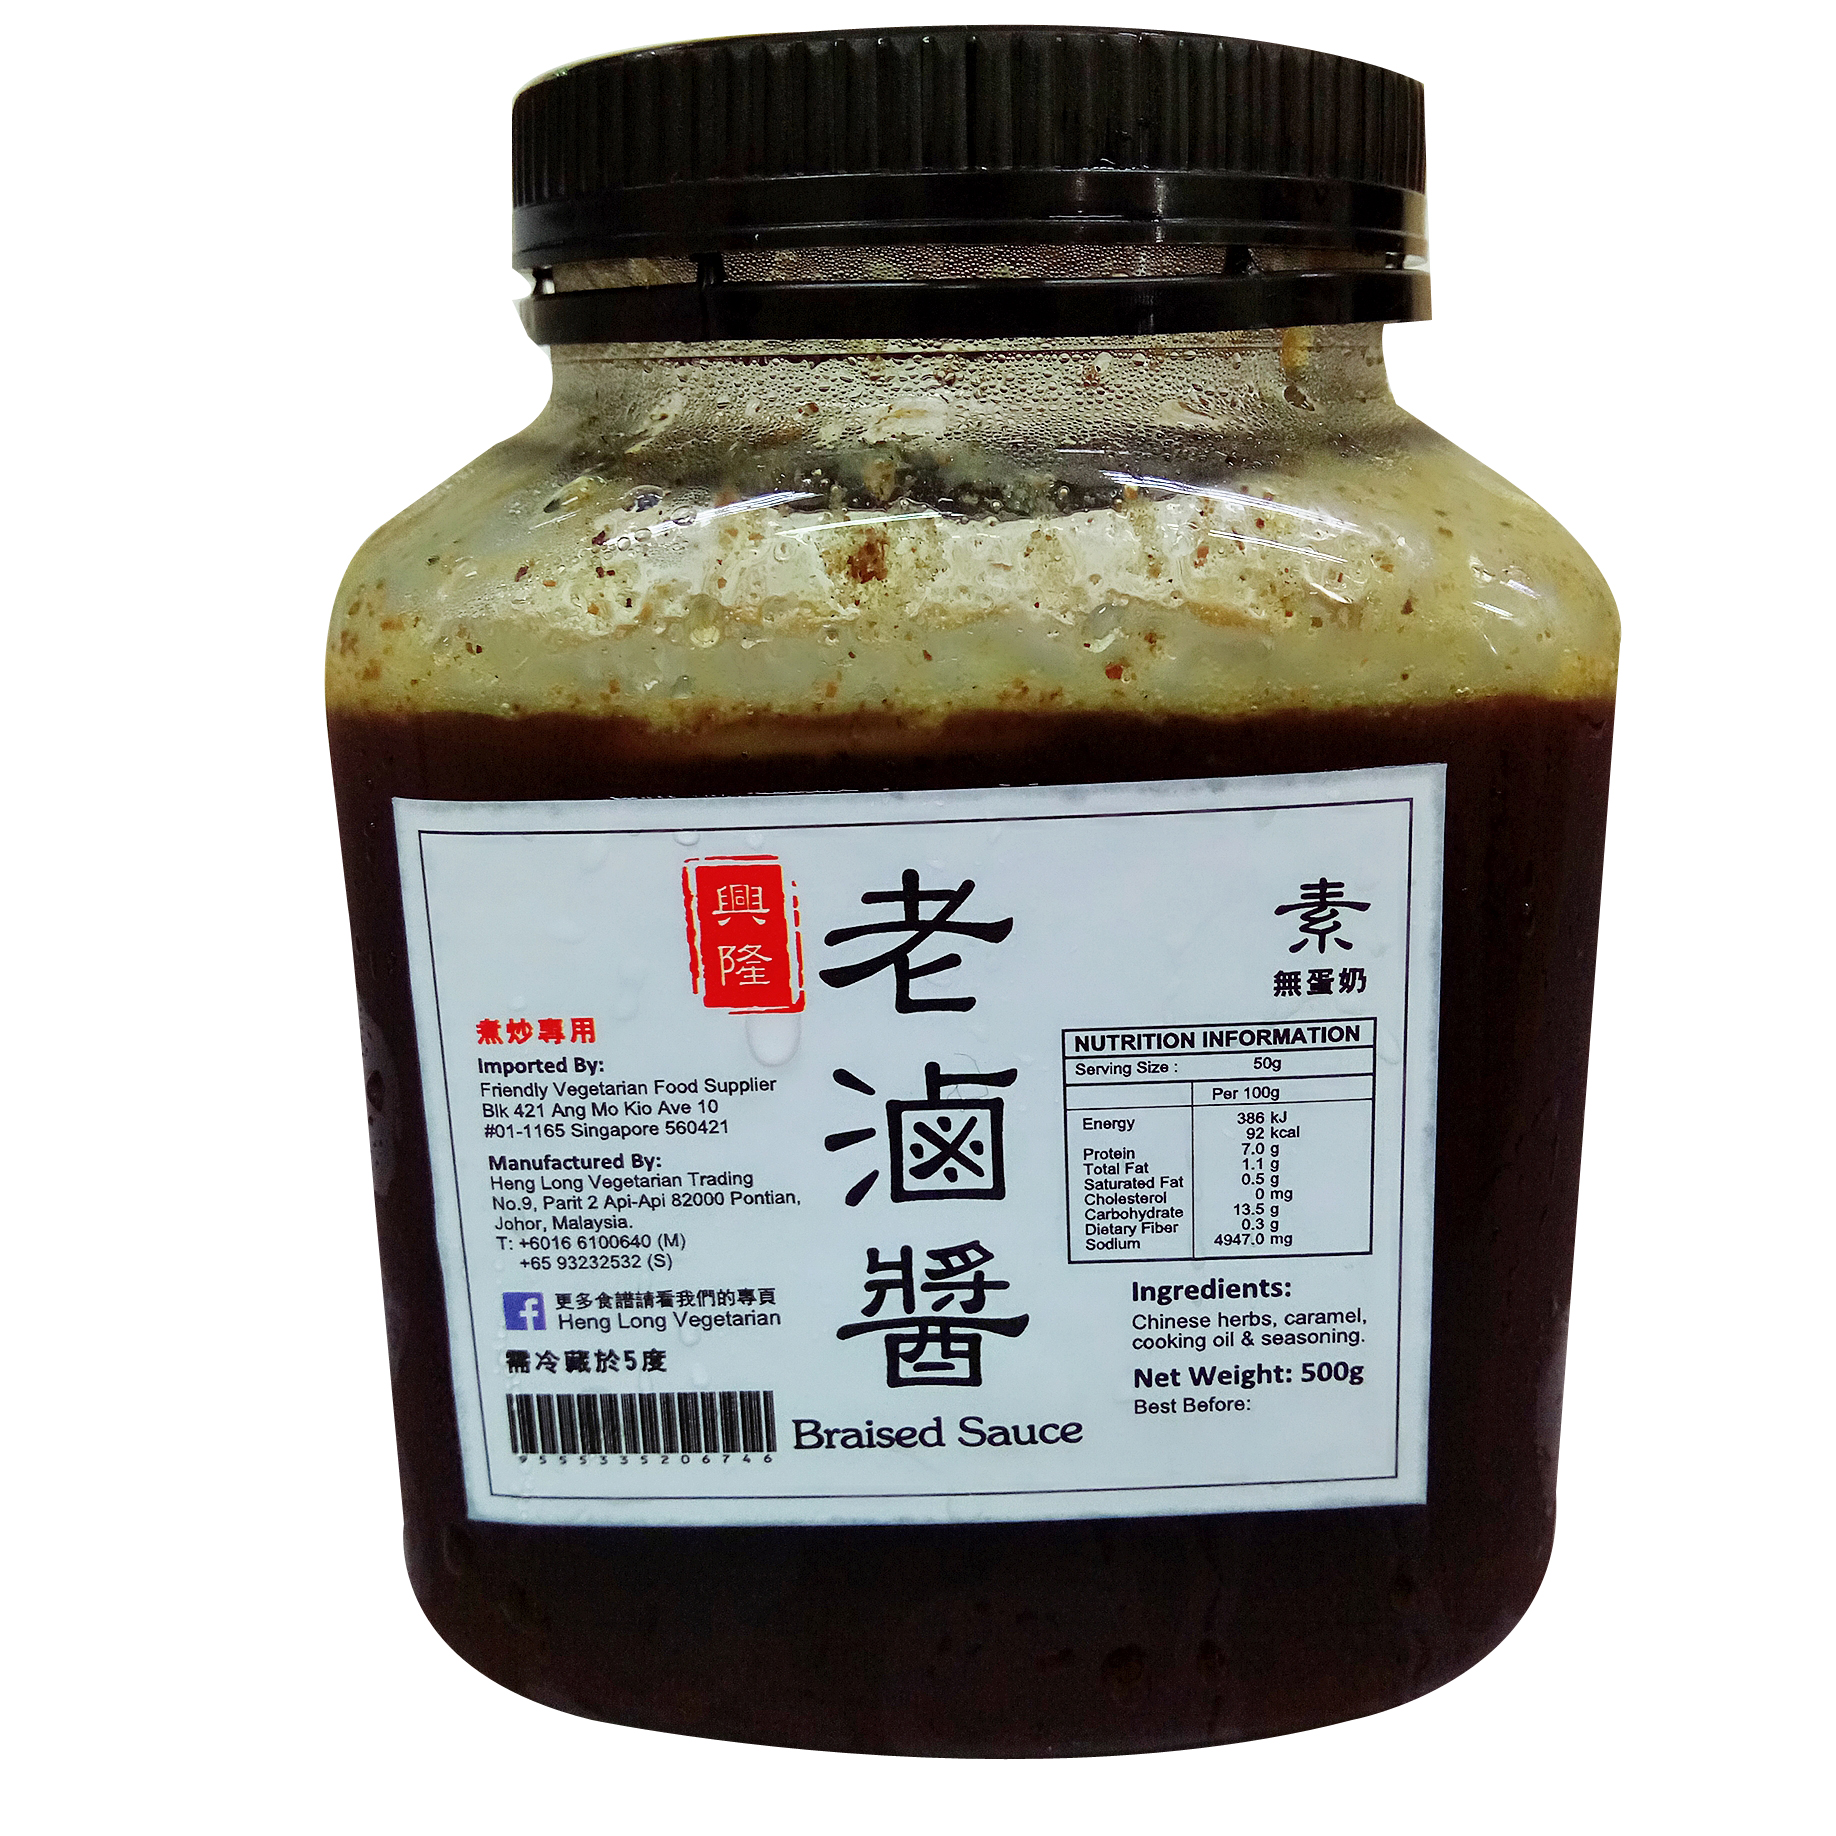 Image Heng Long Braised Sauce 兴隆 - 老滷酱 500grams